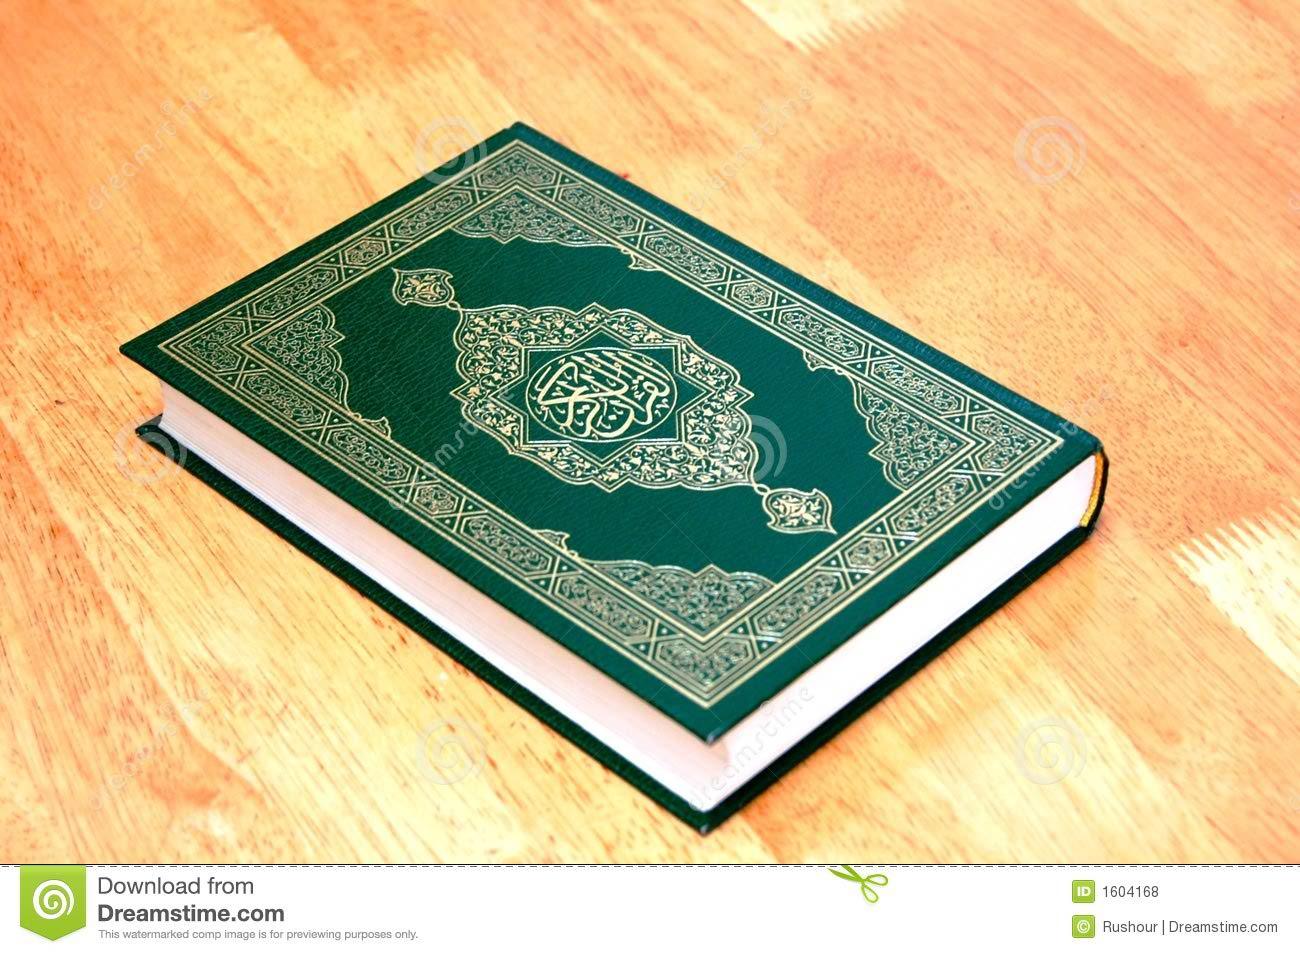 Wallpapers iphone quran - Nice Holy Quran Wallpaper